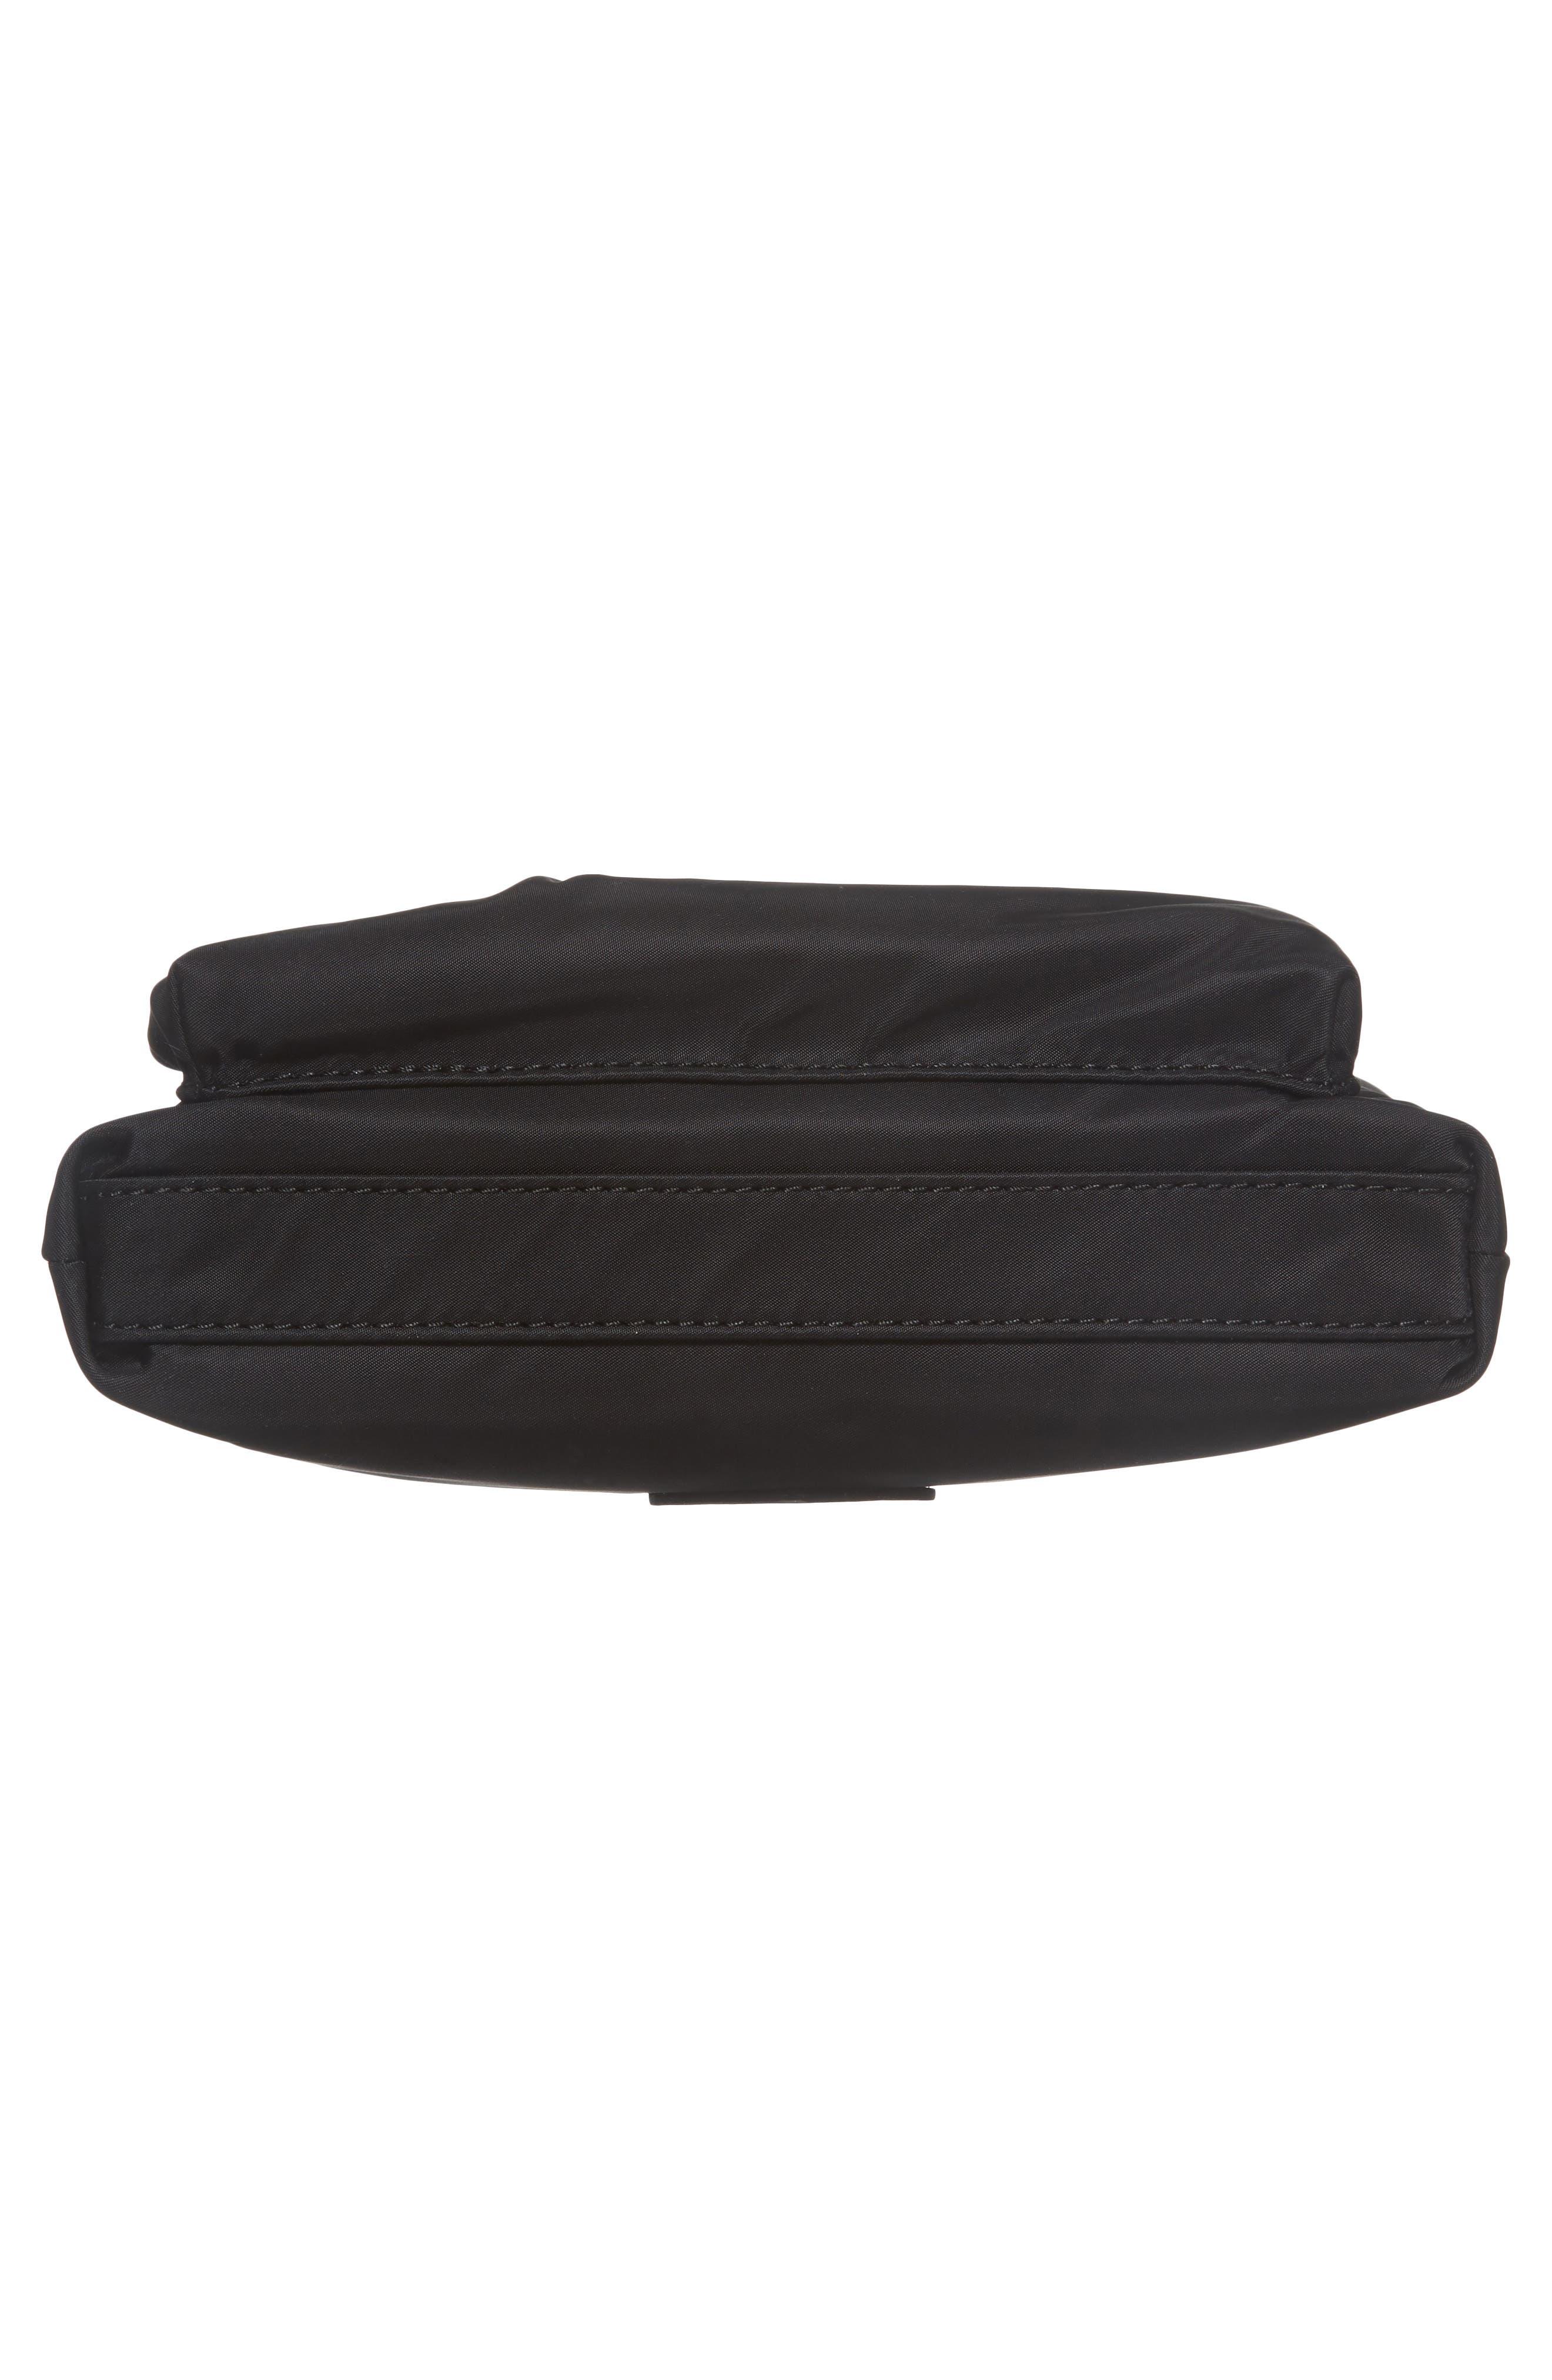 Jordan Bedford Nylon Crossbody Bag,                             Alternate thumbnail 6, color,                             008